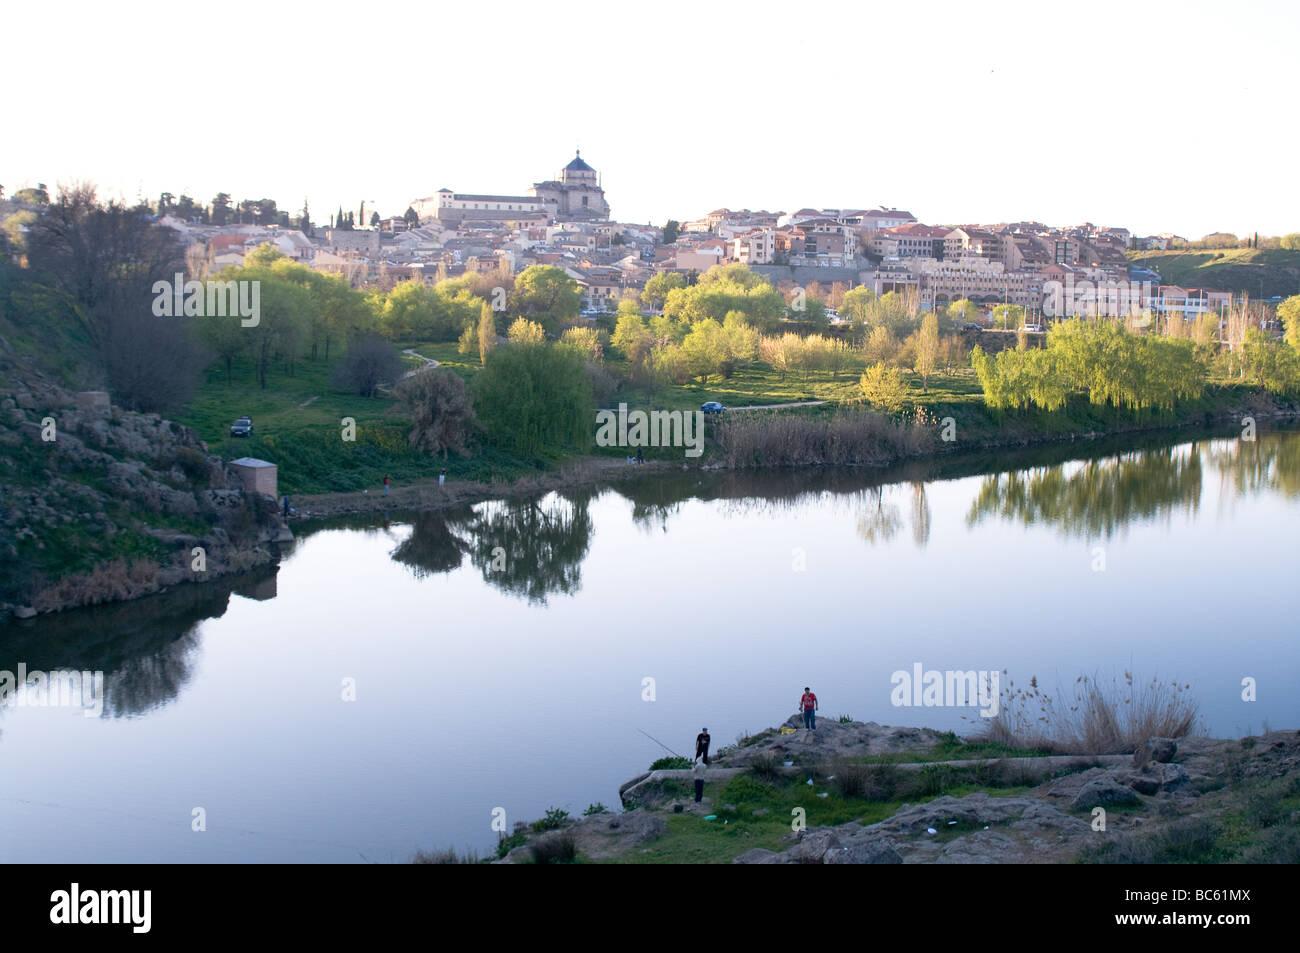 Vista de toledo desde la orilla opuesta del rio Tajo Town view of Toledo on rio Tajo - Stock Image